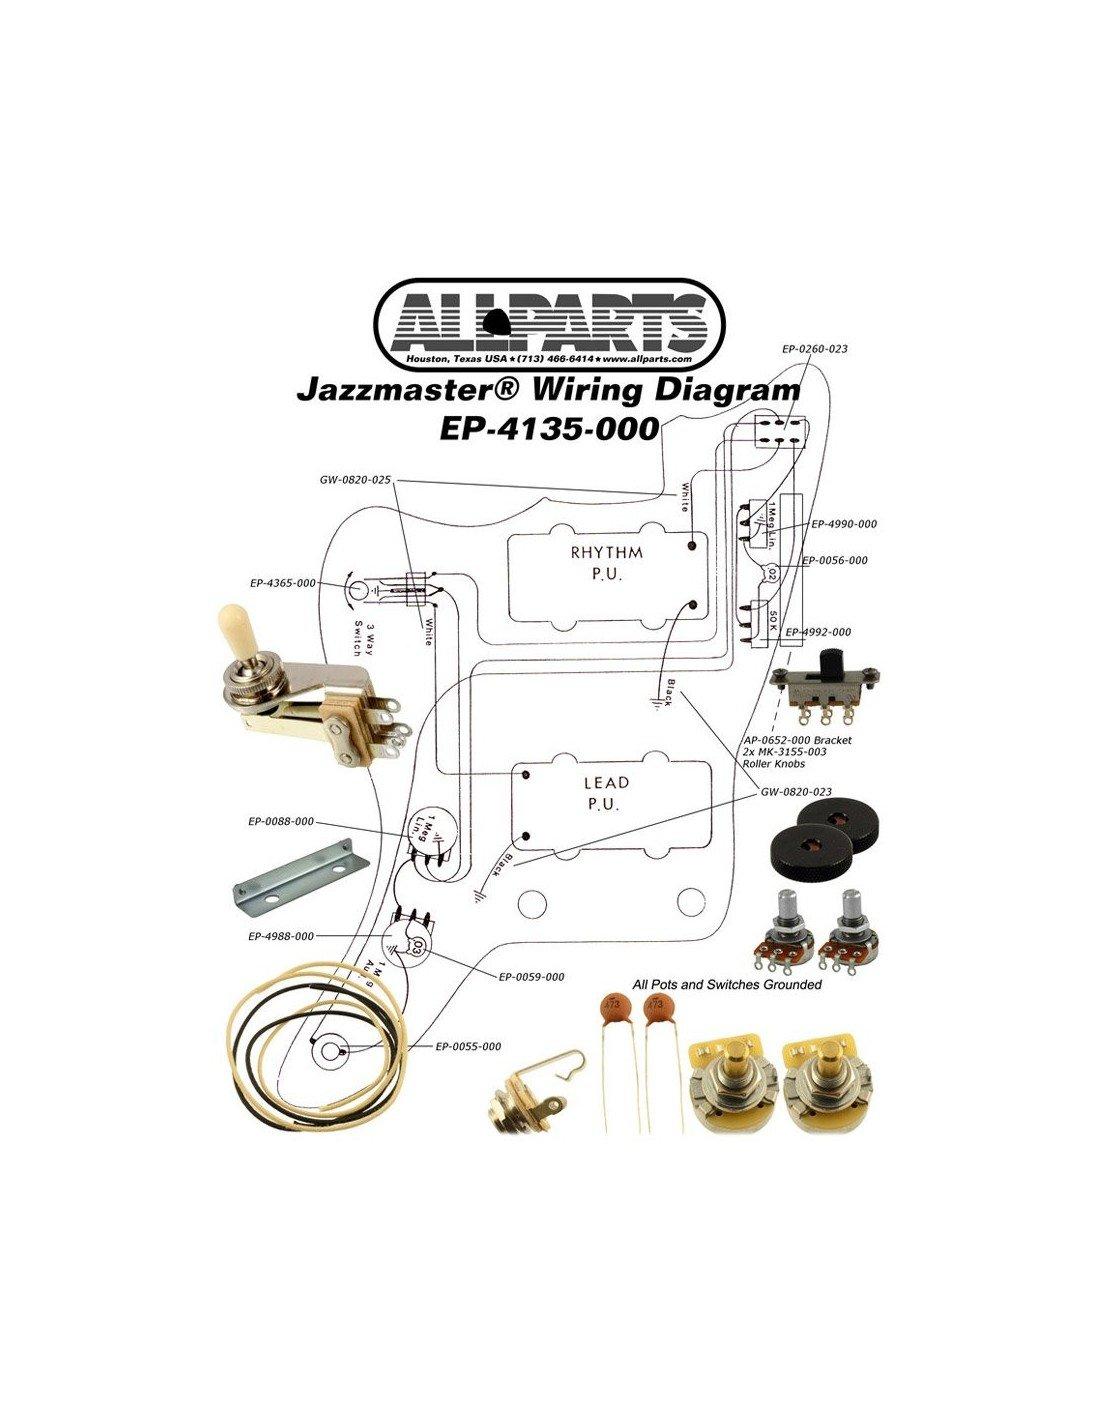 Comprar Allparts Ep 000 Wiring Kit For Jazzmaster